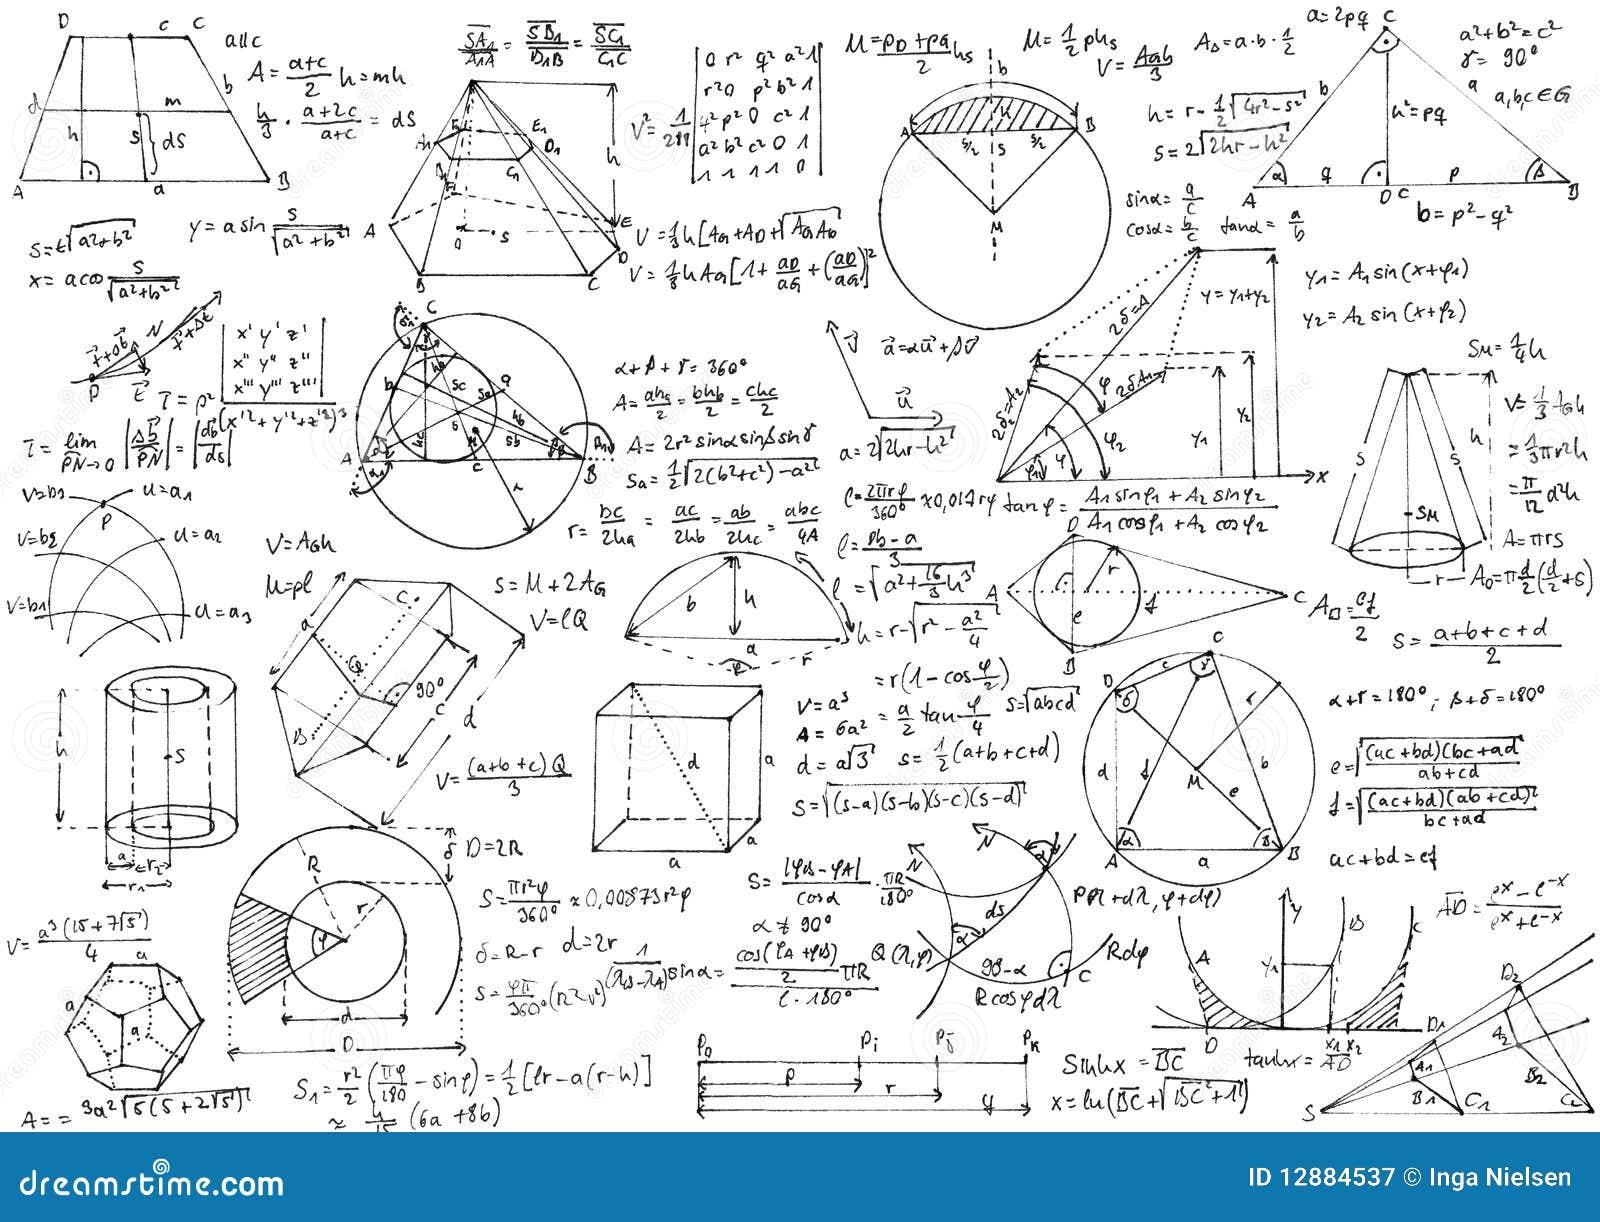 INTP] Algebra or Geometry